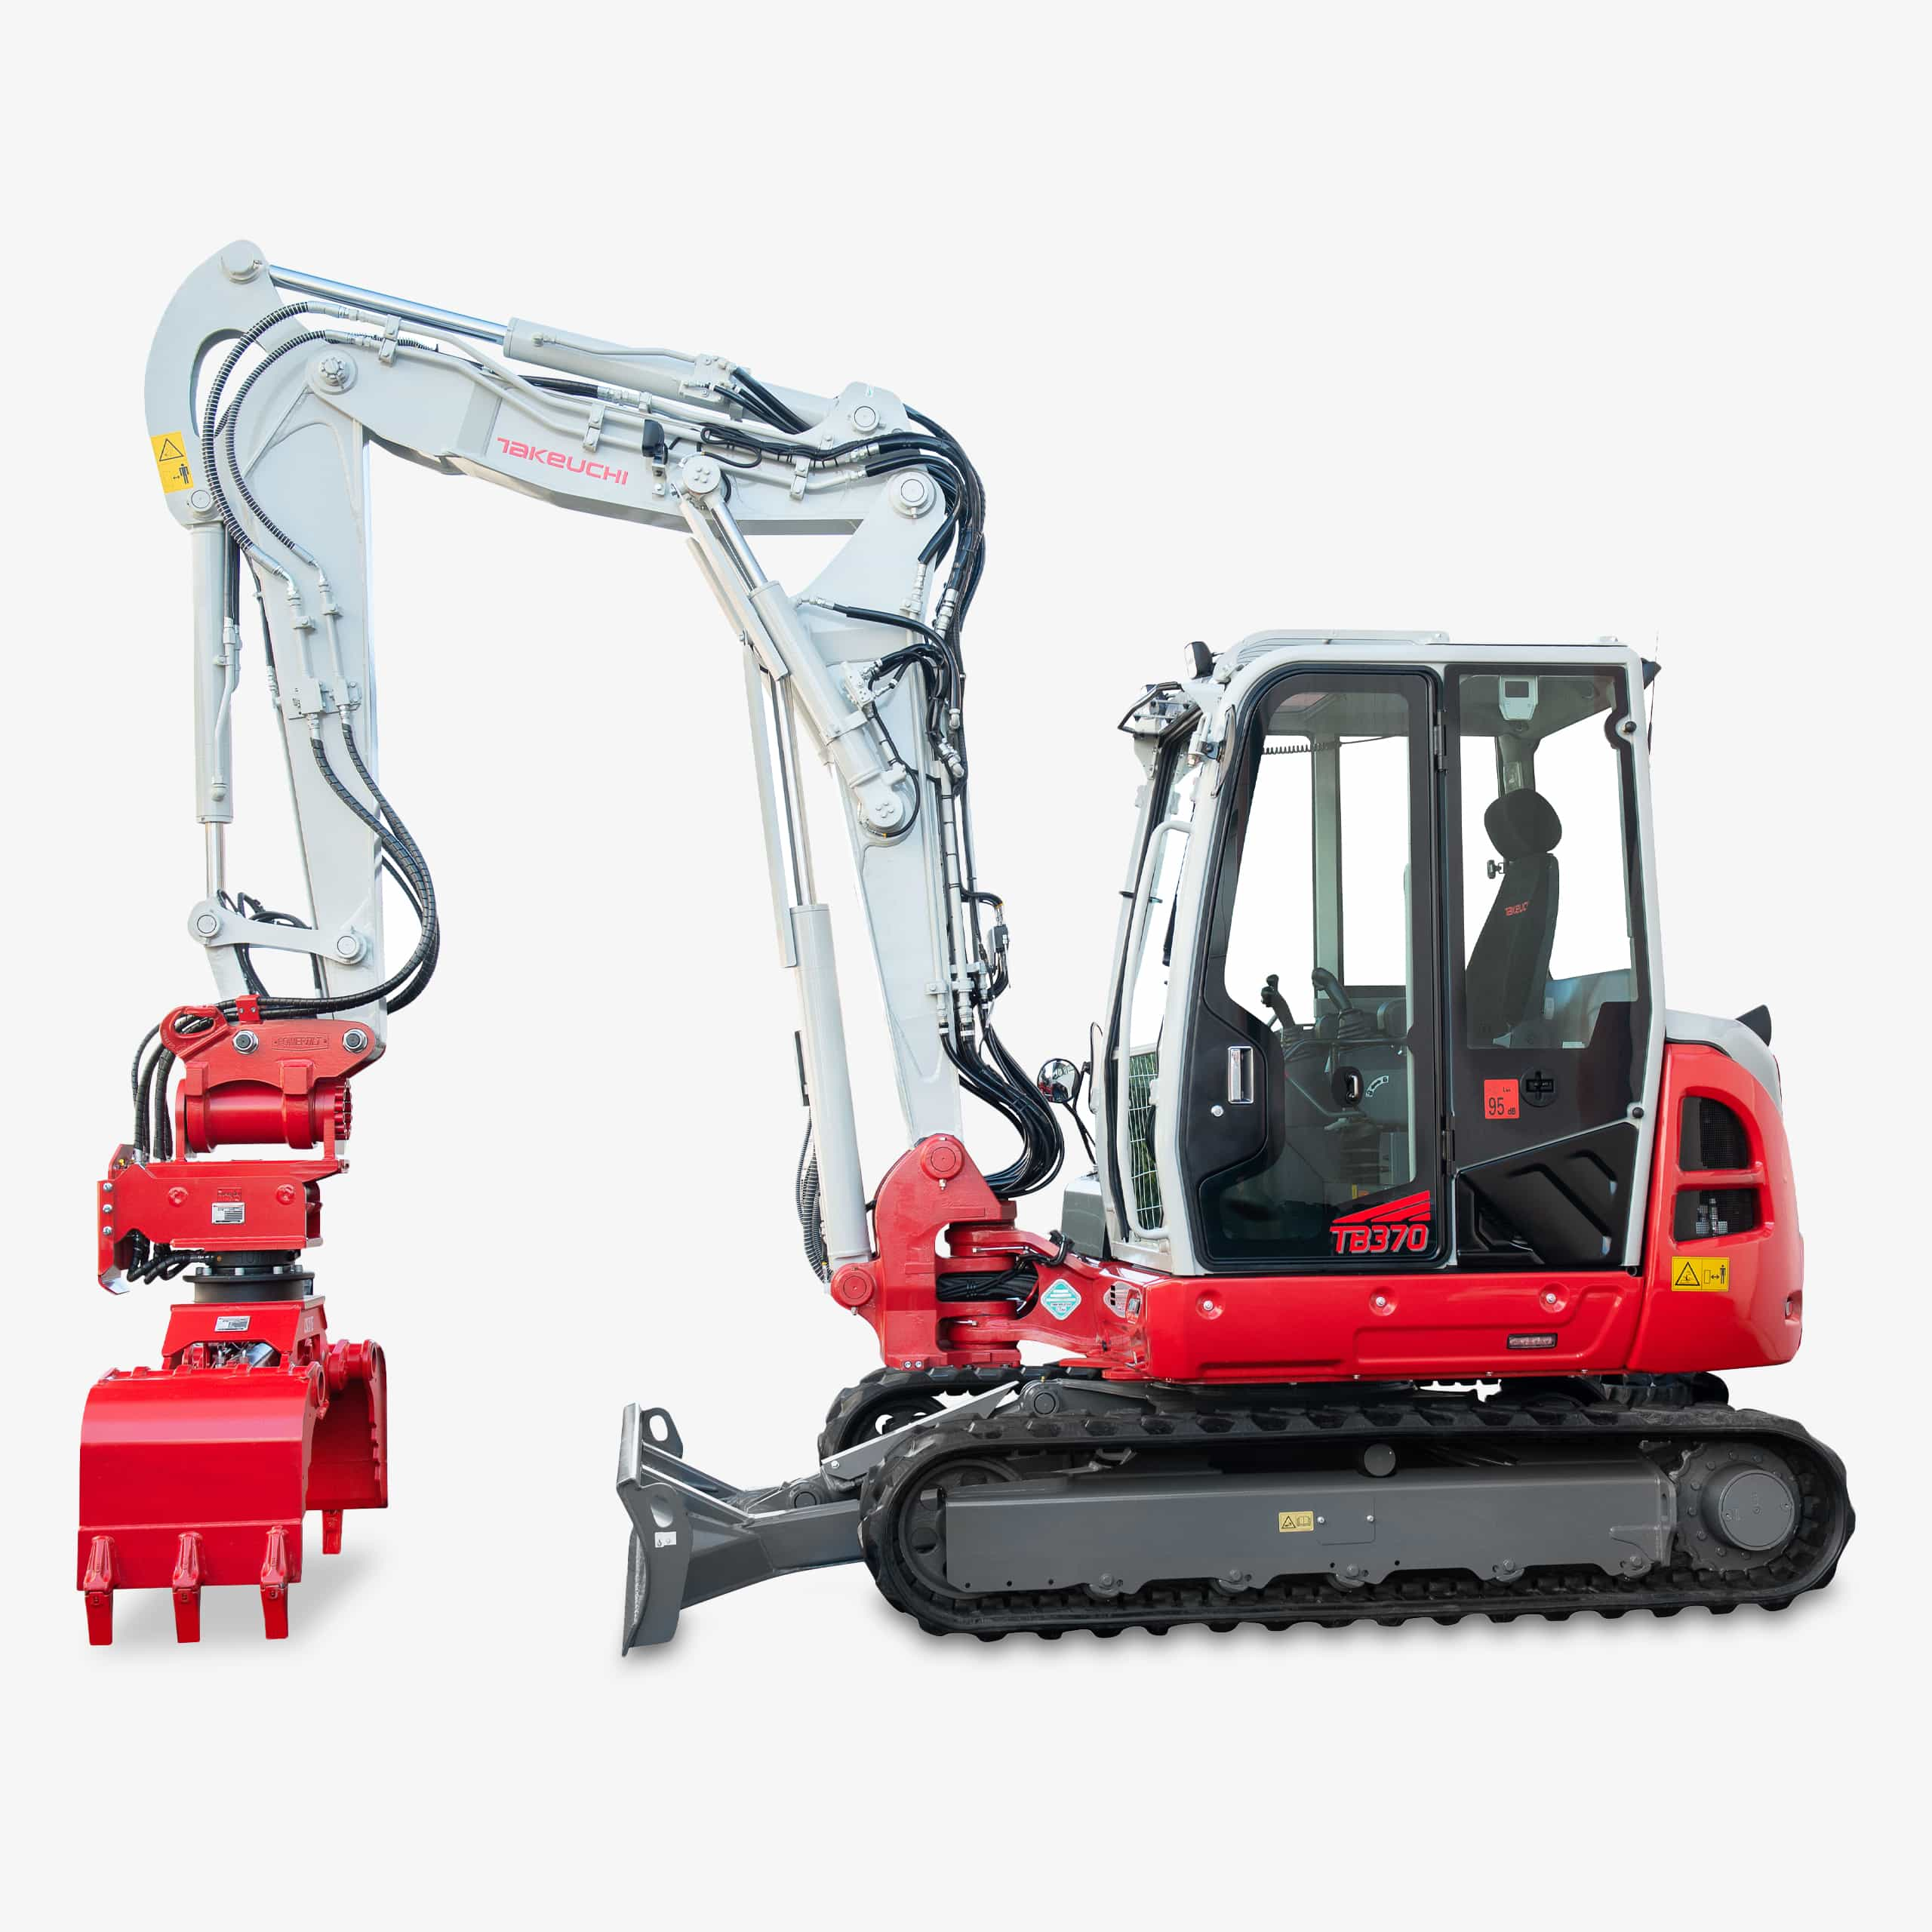 Huppenkothen Baumaschinen Bagger Midibagger Takeuchi TB370 Universalgfreifer Huppgrip